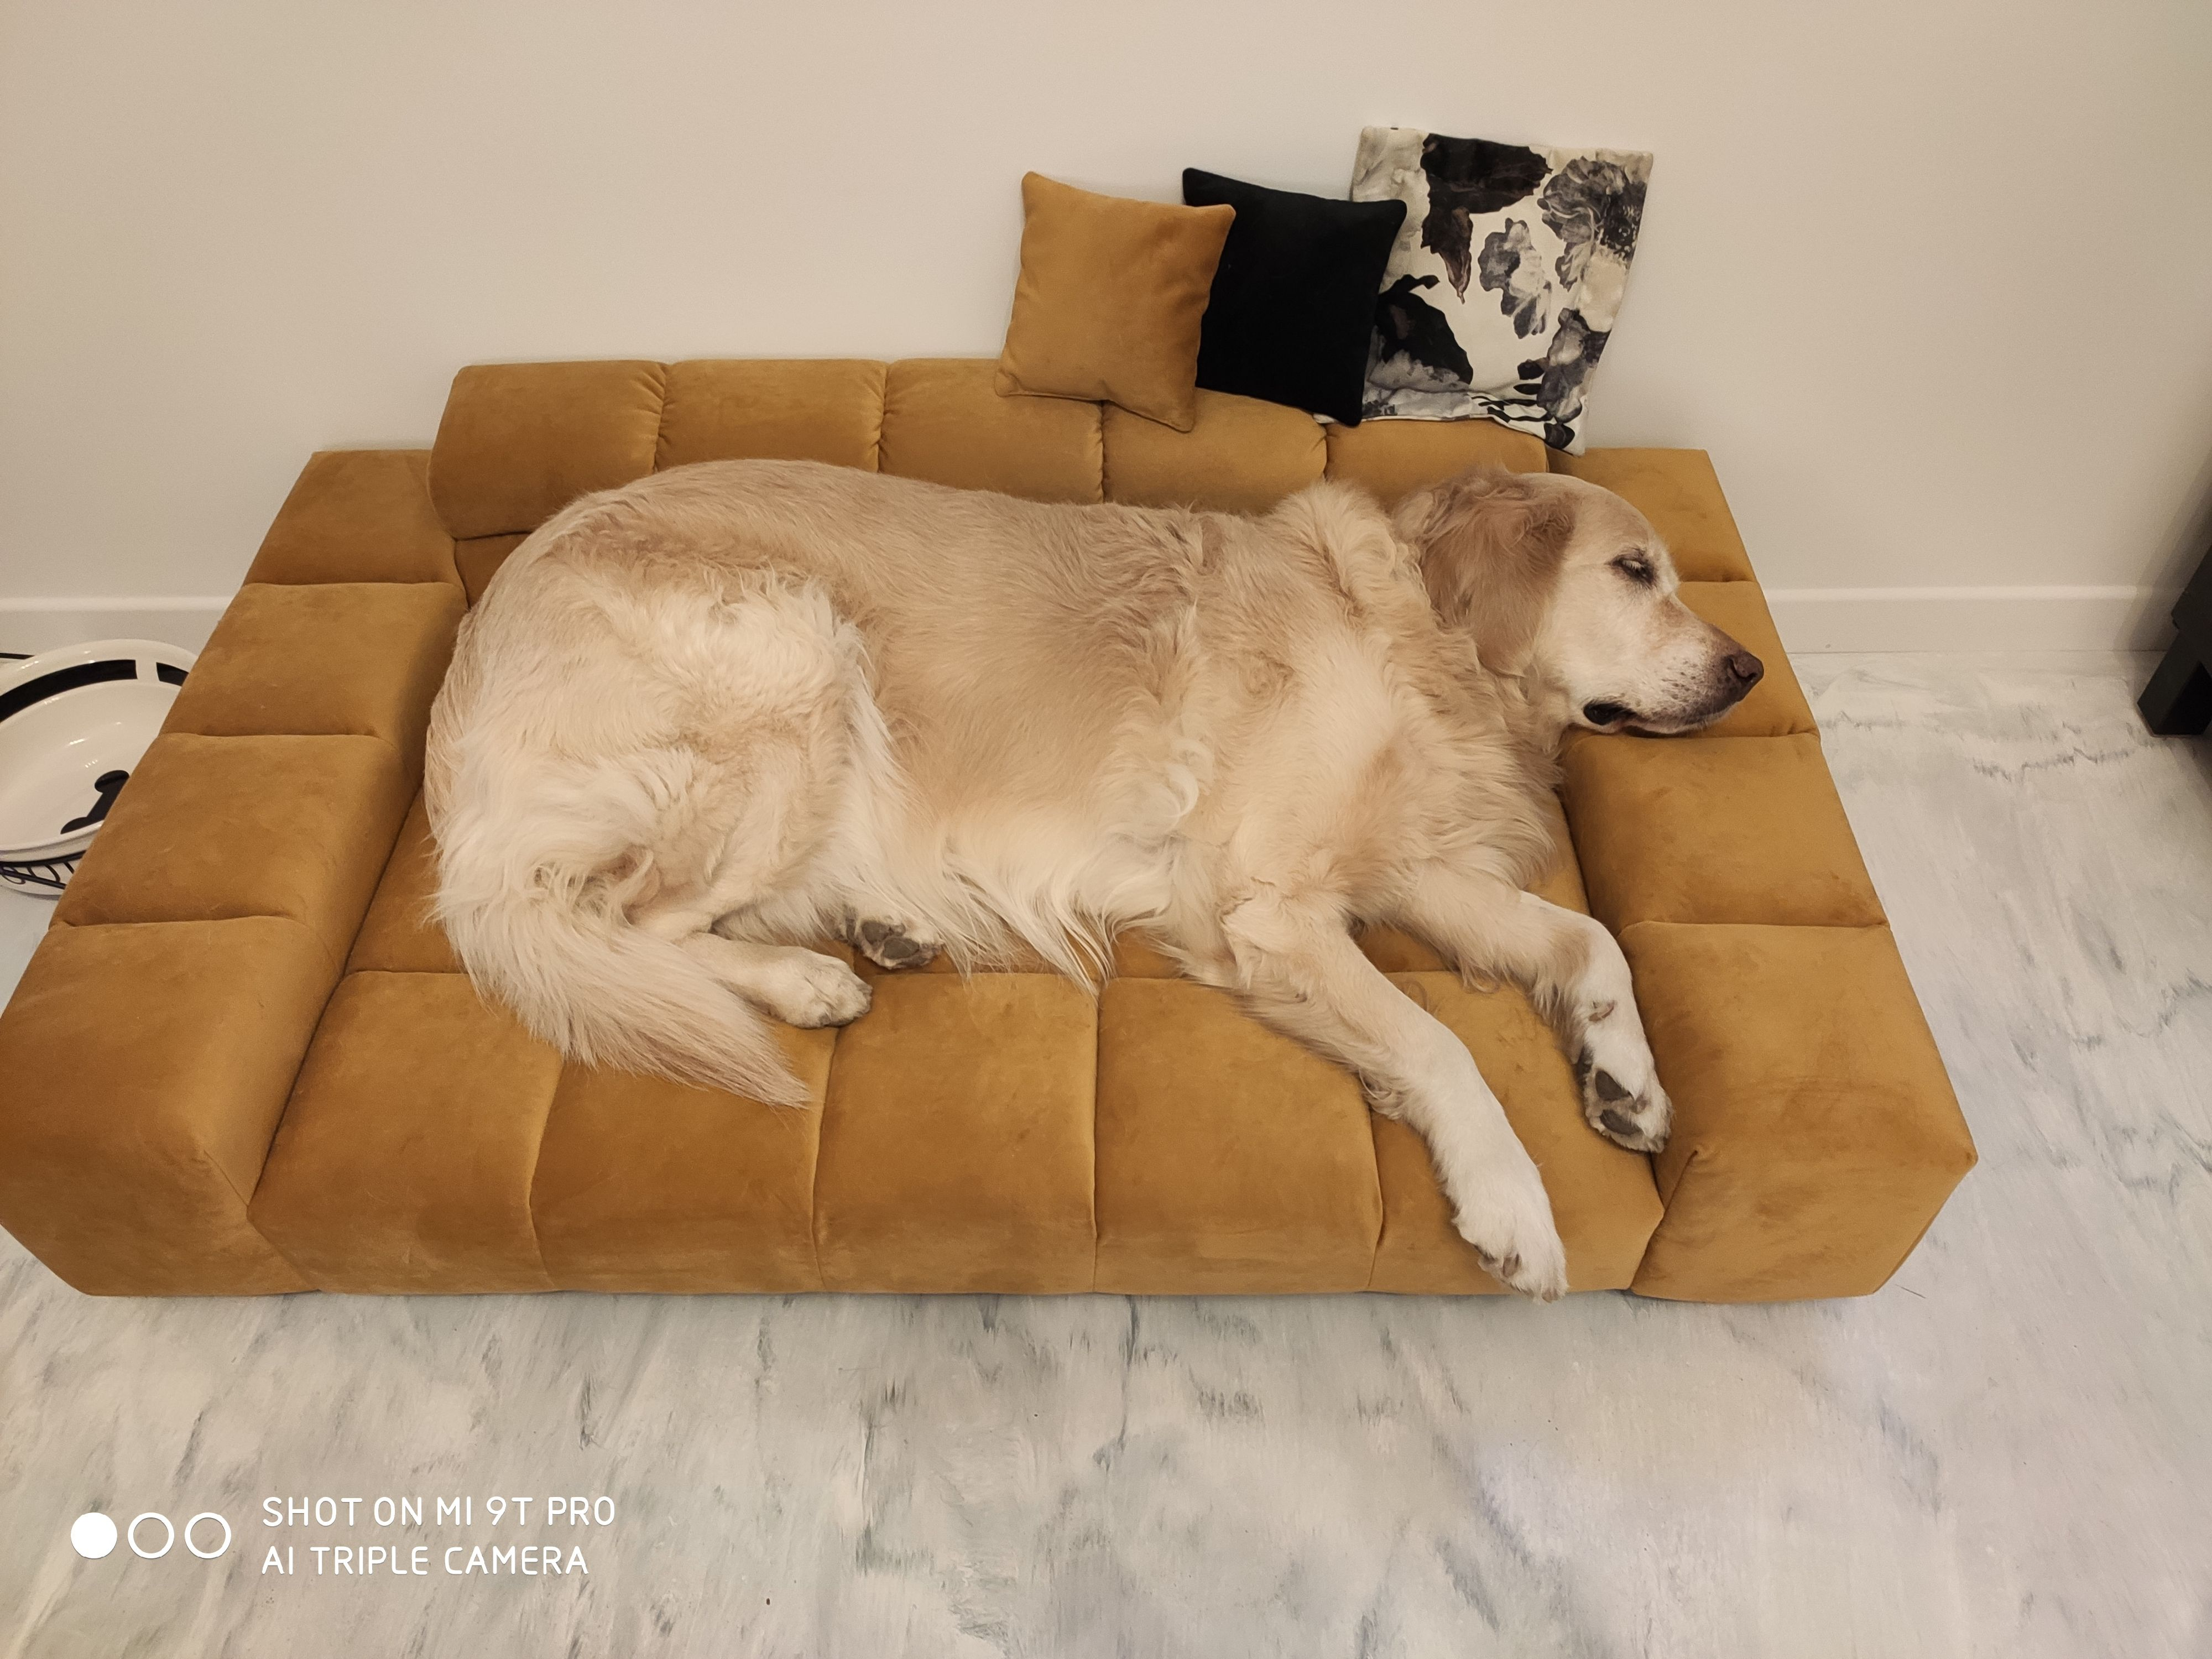 Minisofa Duze Legowisko Dla Psa Couch Home Decor Decor